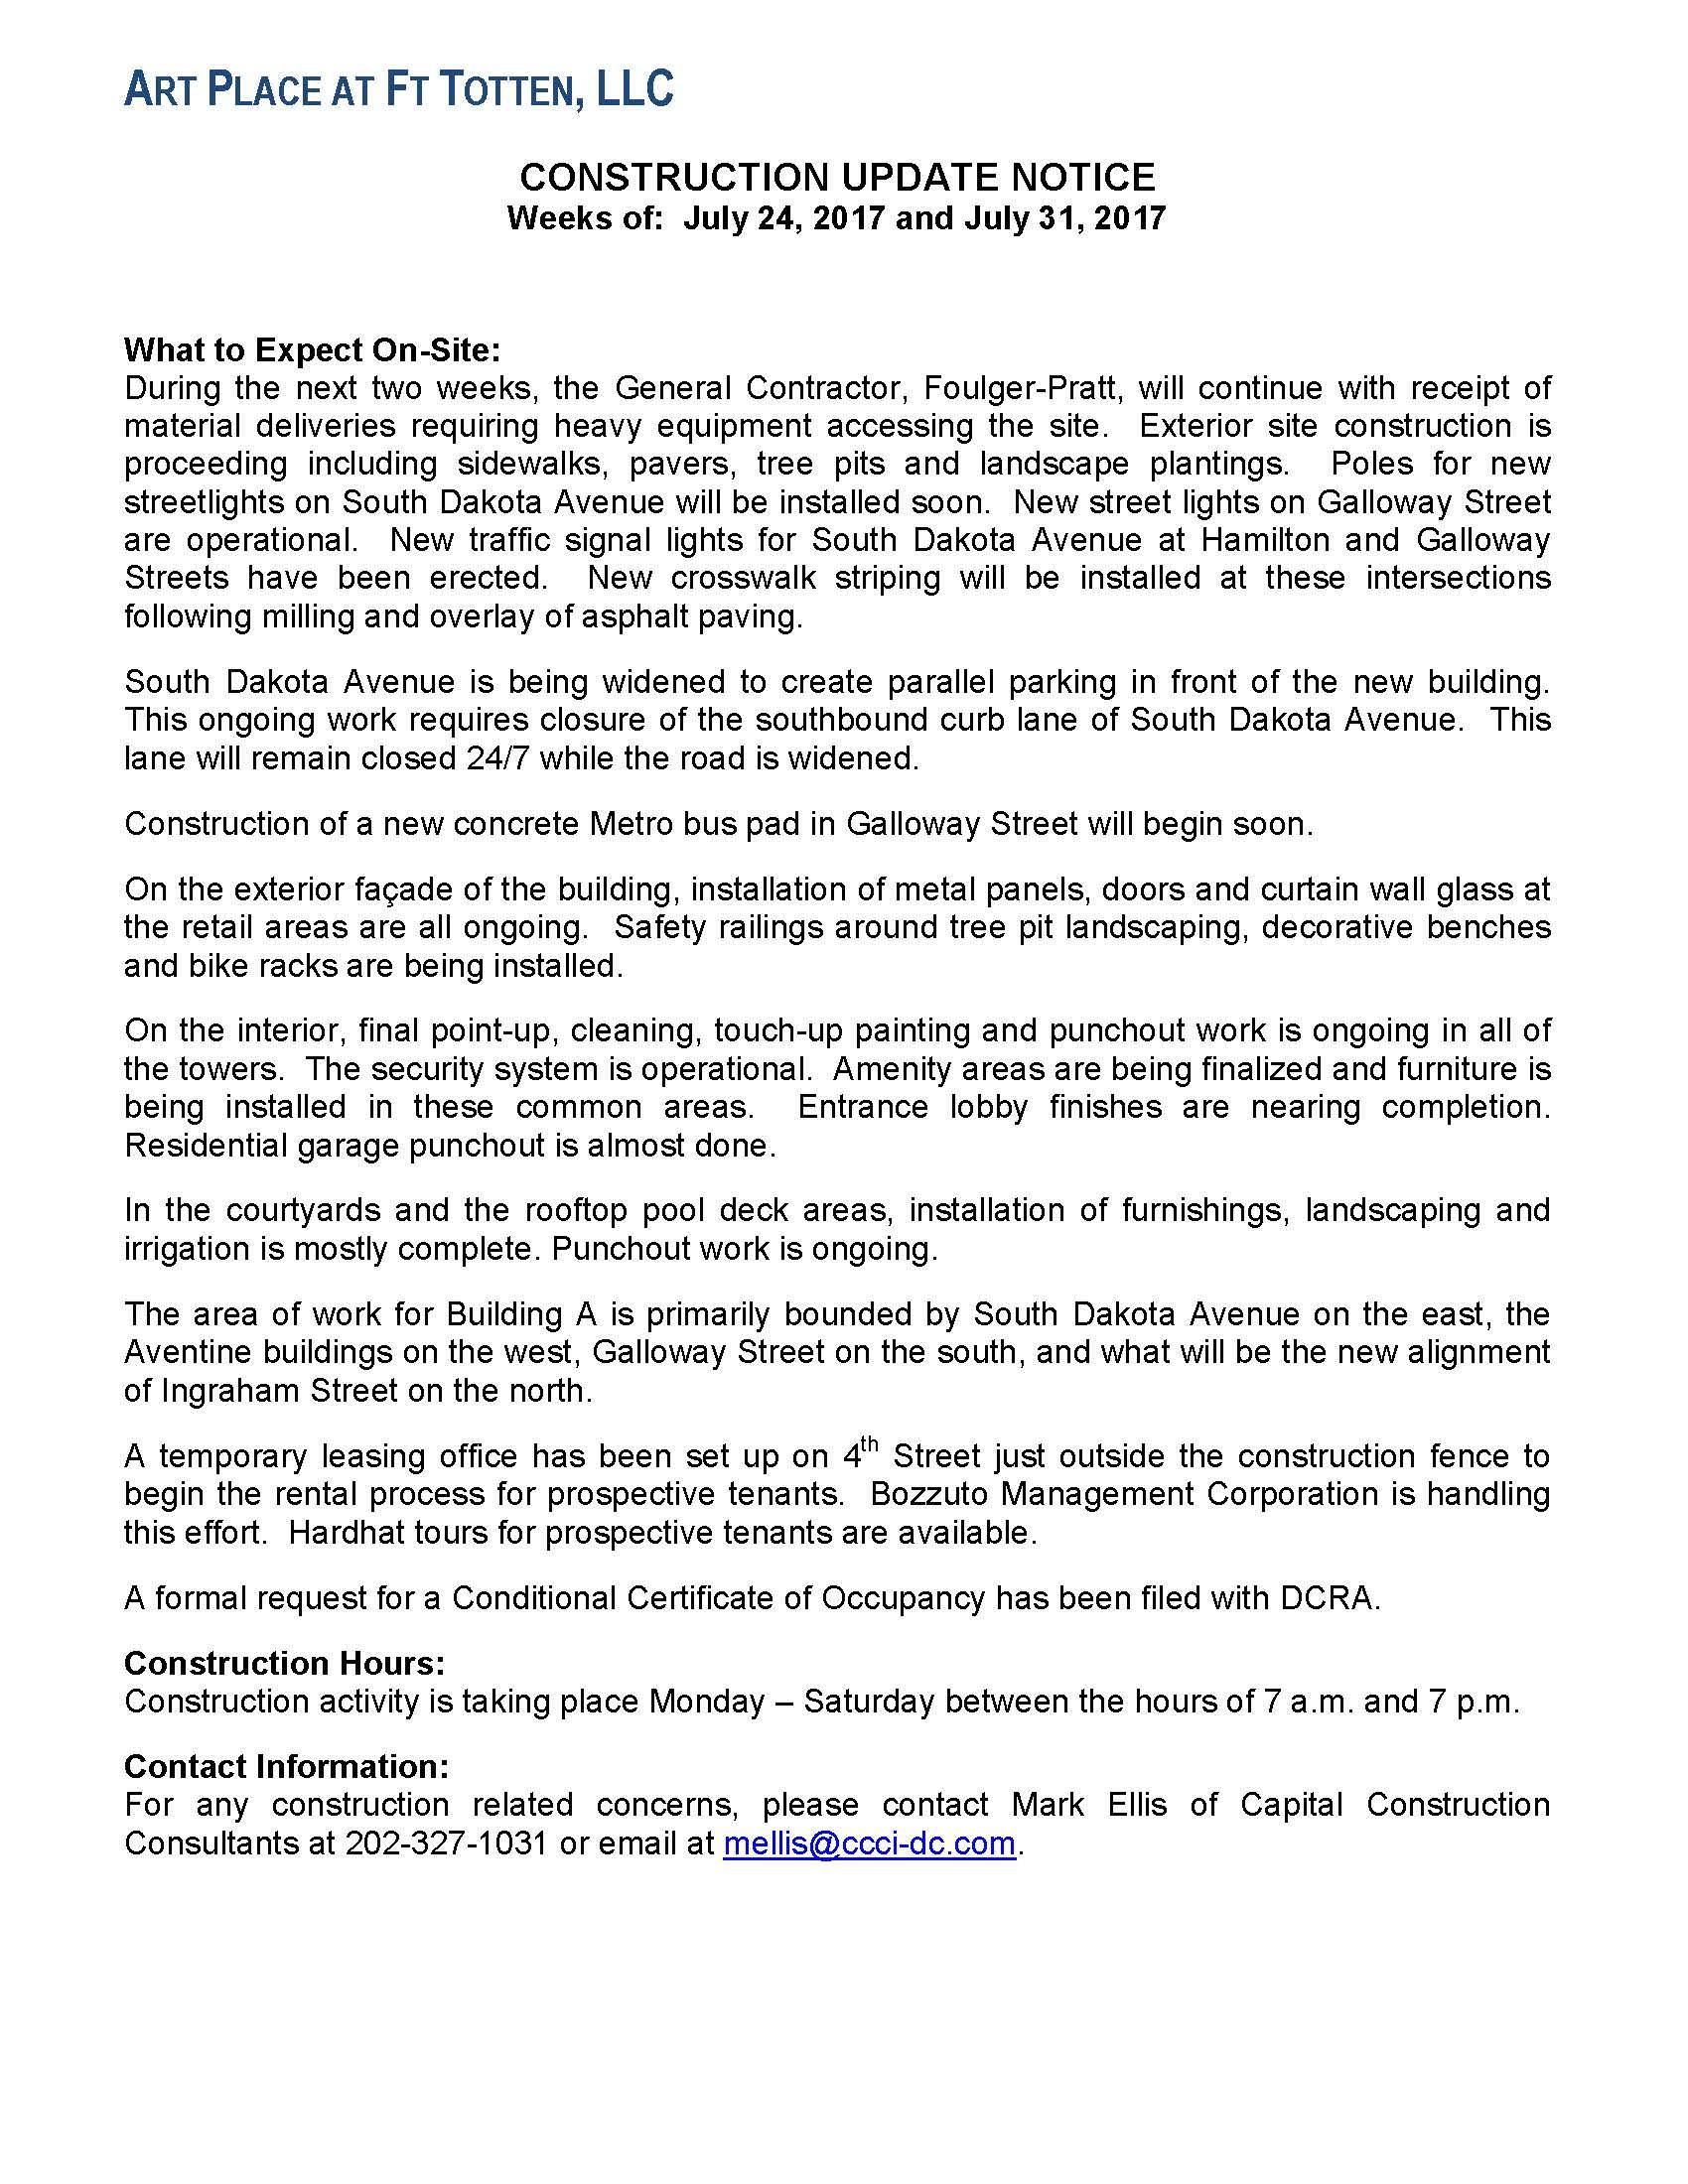 Art Place Construction Notice Next Stop - 2017 july 31